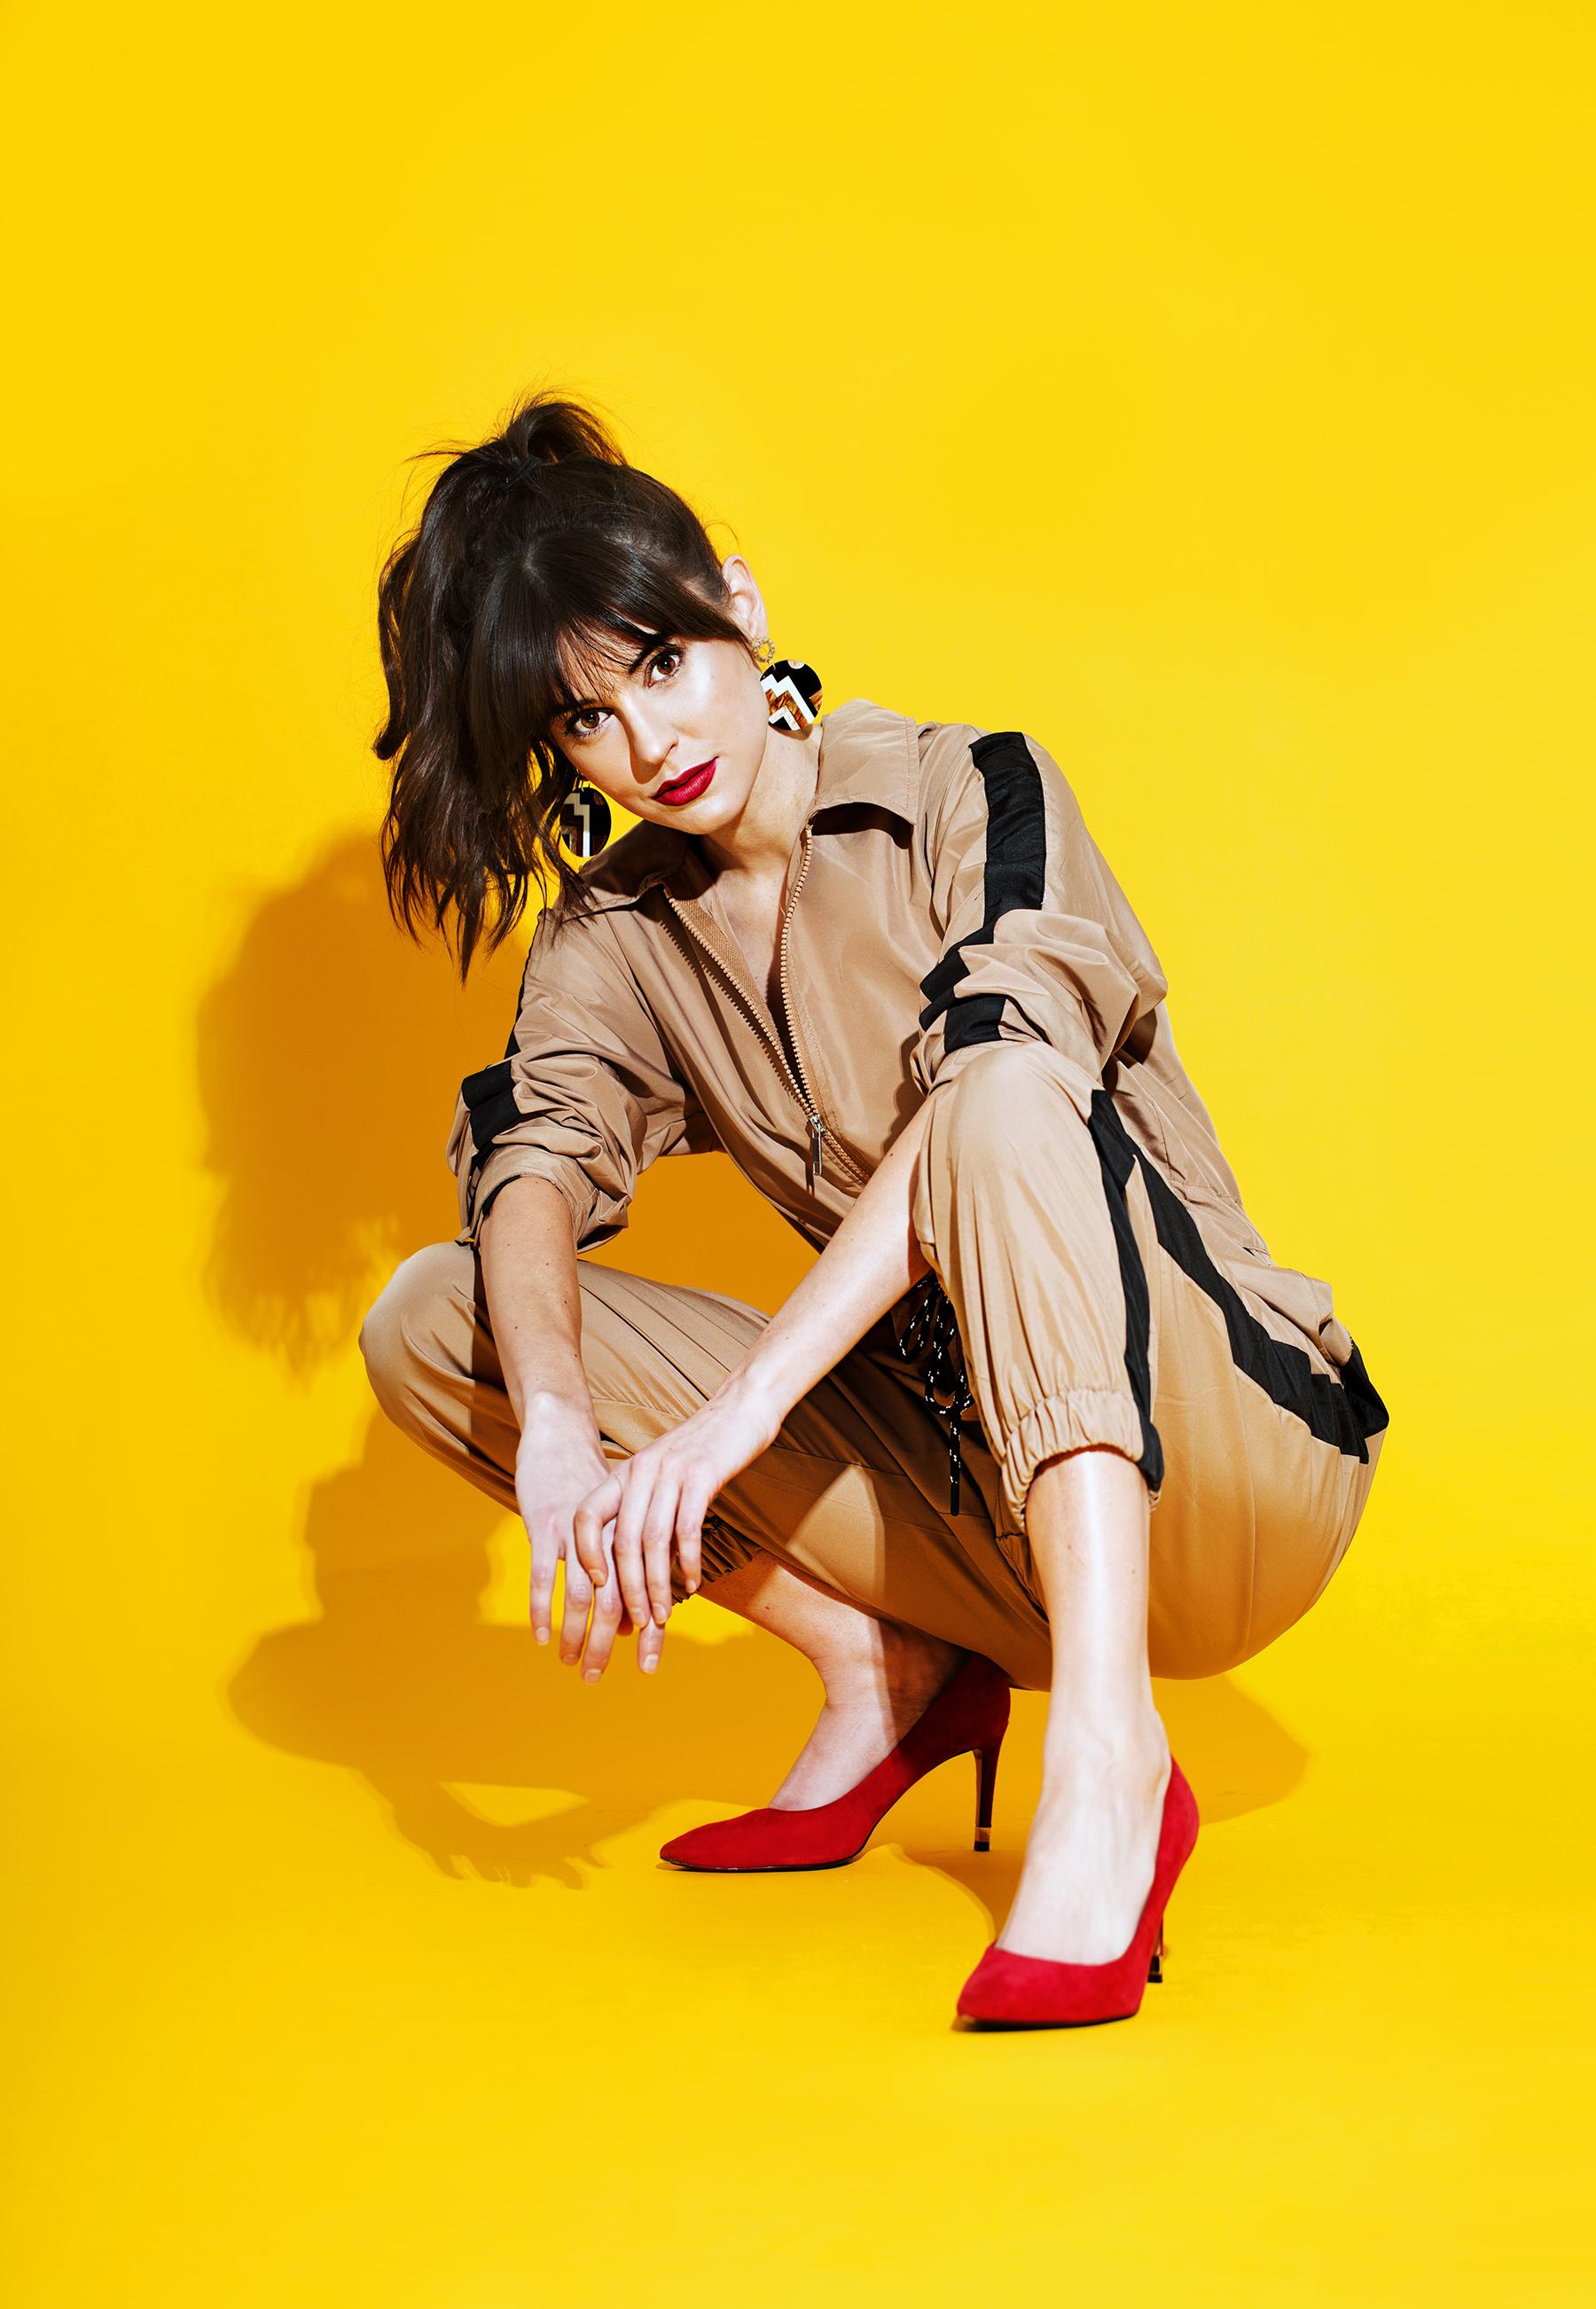 Danielle_LA_Models_Commercial_01_WEB.jpg